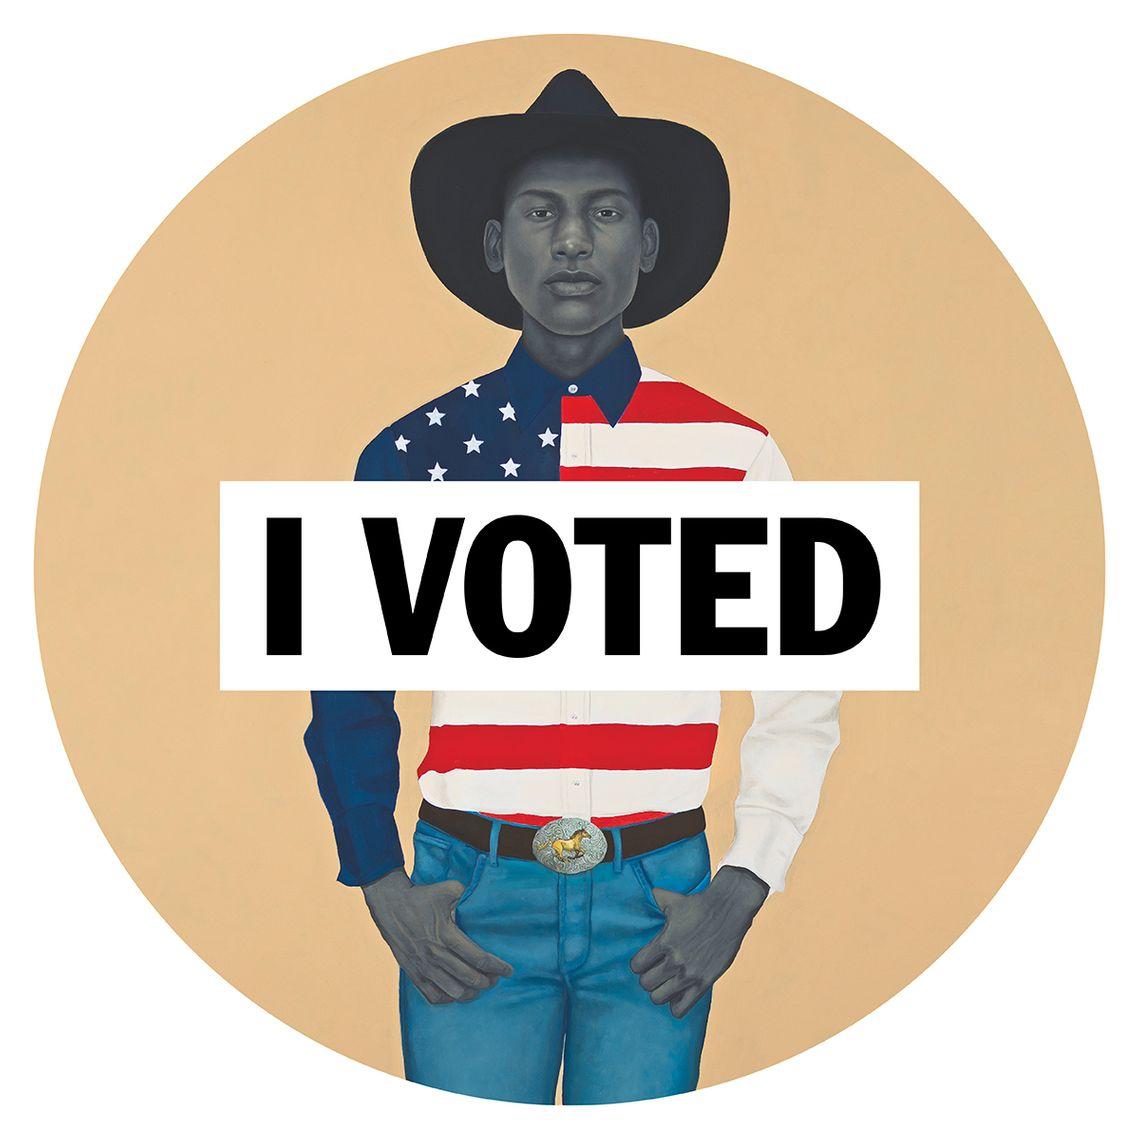 Amy Sherald's 'I Voted' sticker, via New York Magazine.